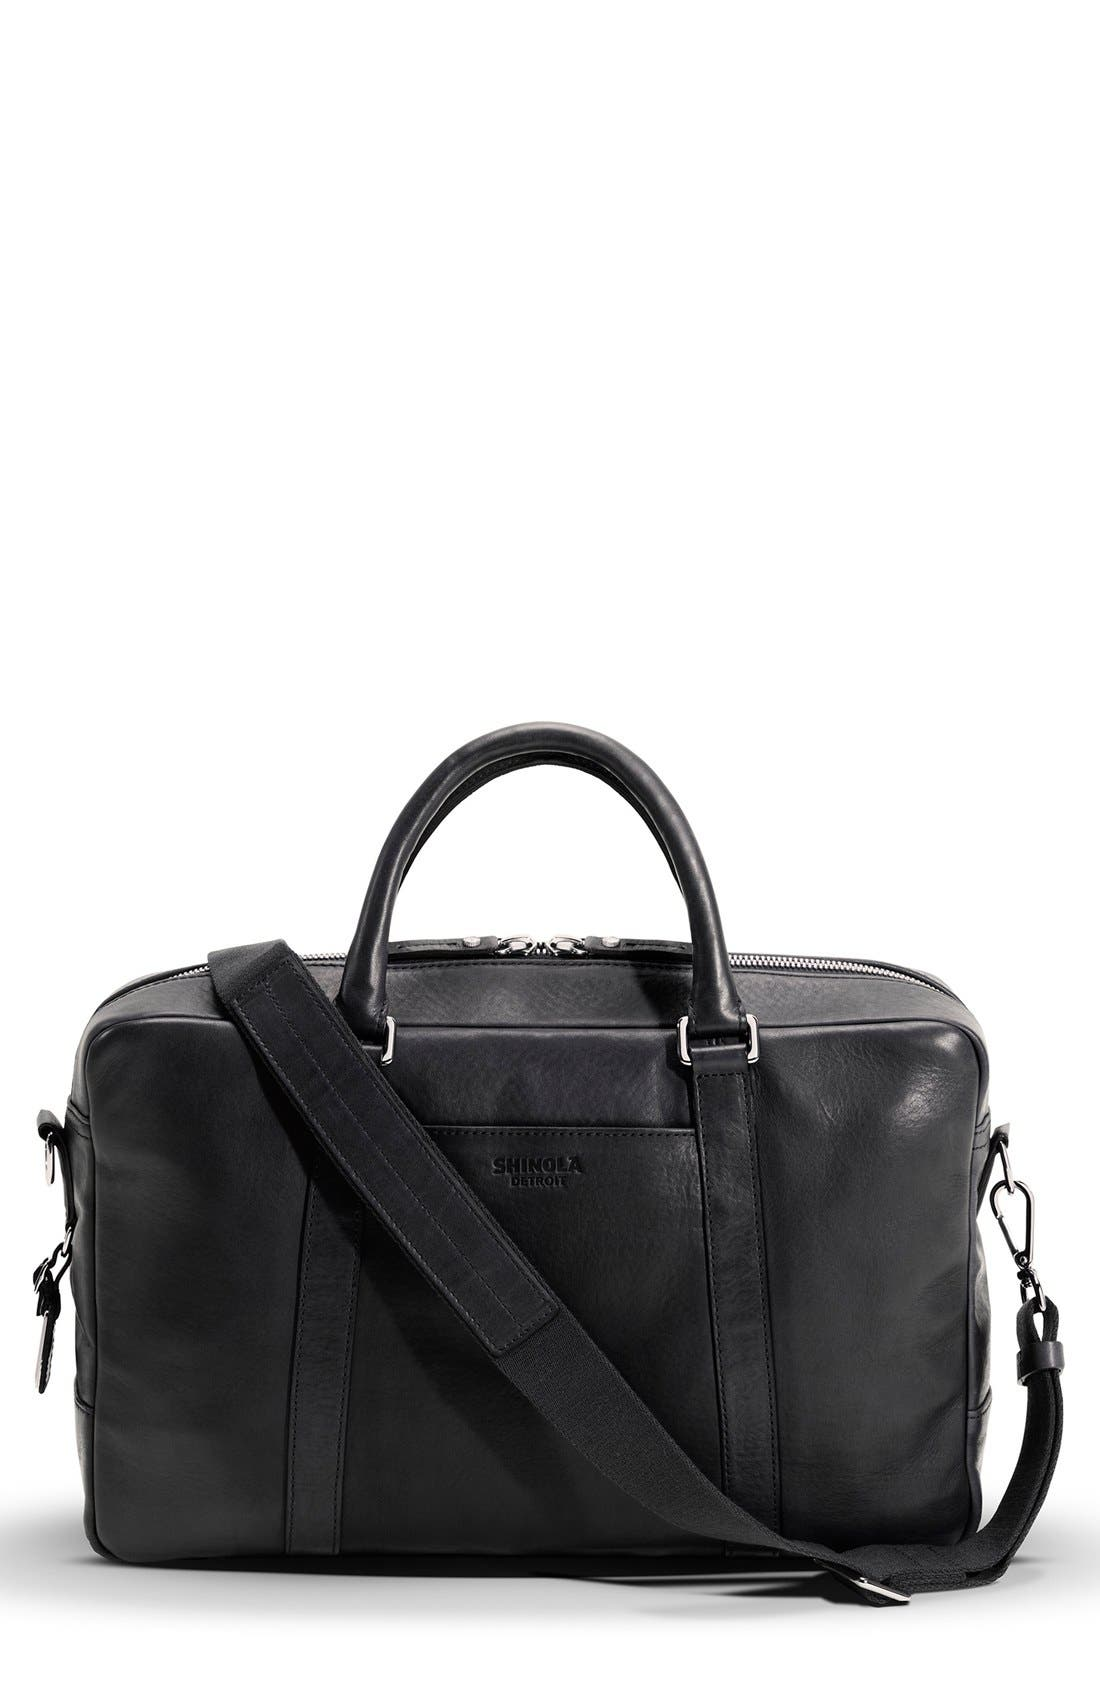 Alternate Image 1 Selected - Shinola Signature Leather Slim Briefcase